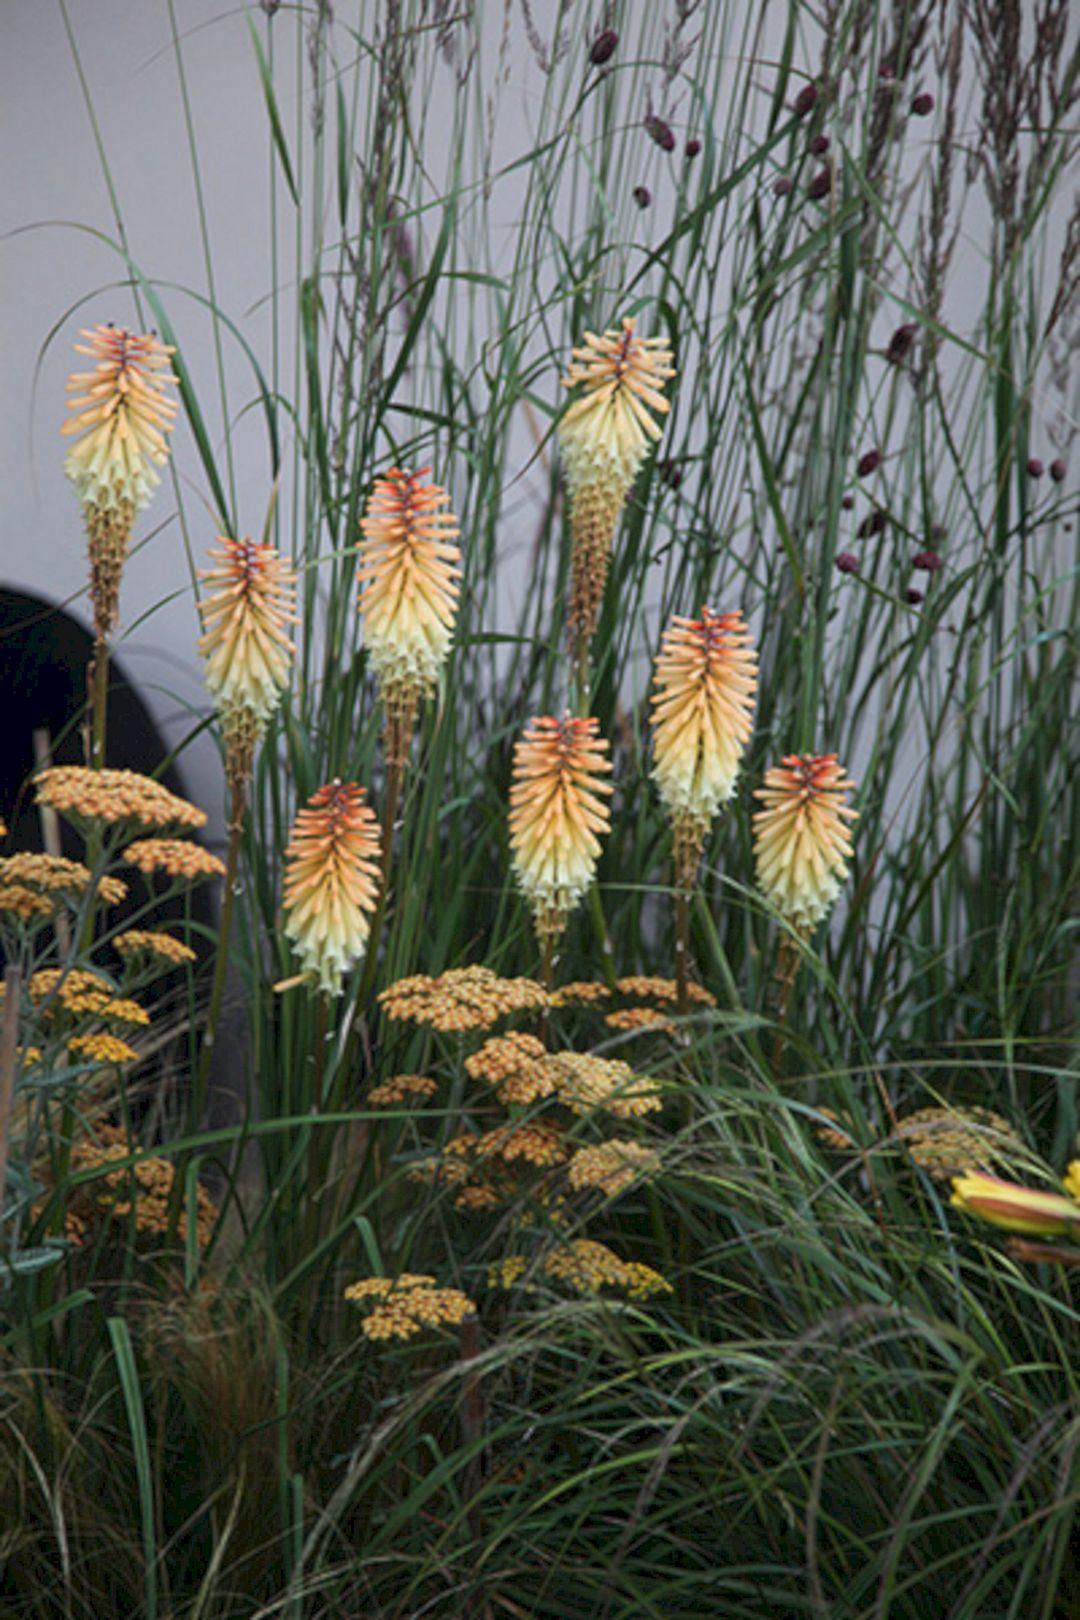 Best 75+ Best Planting Combination Ideas For Beautiful Garden Https://freshouz.com/75-best-planting-combi… | Beautiful Gardens, Plant Combinations, Flower Landscape